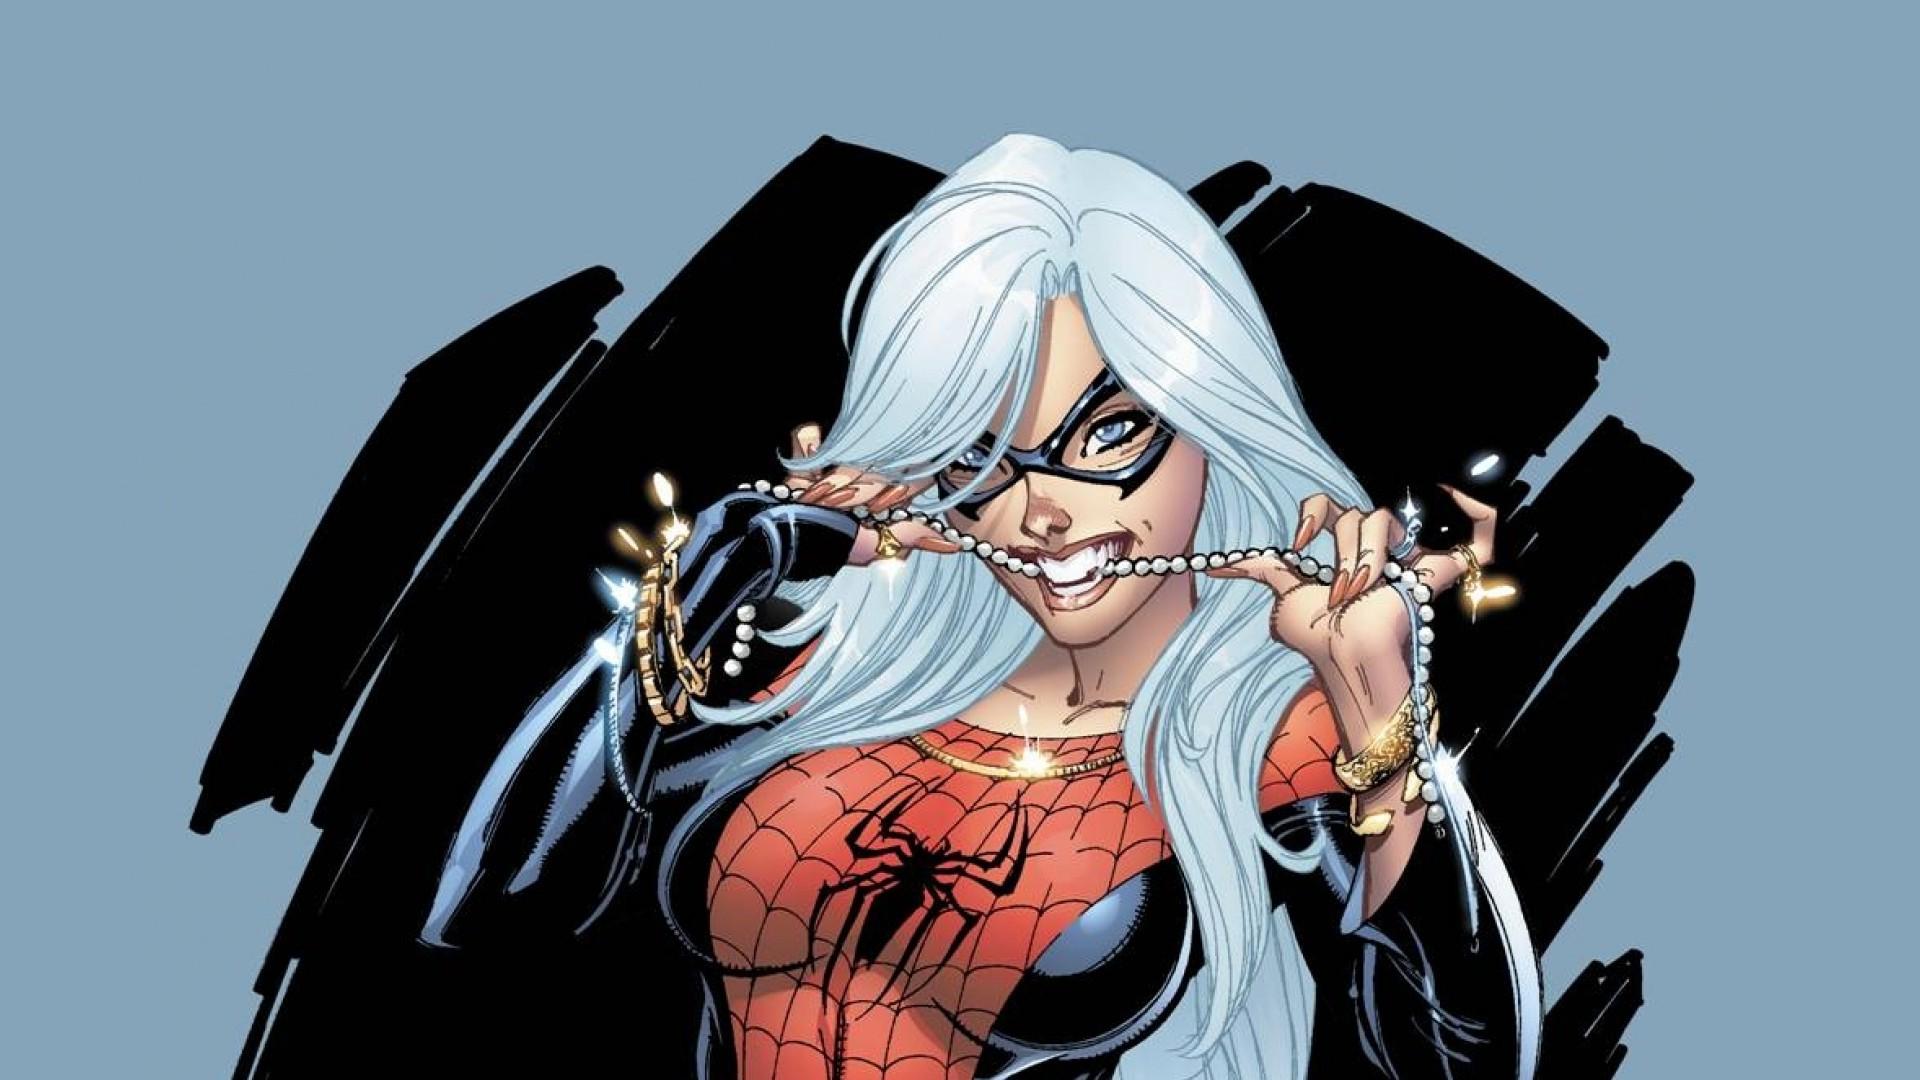 illustration, Marvel Comics, Black Cat (character), Costumes, J. Scott